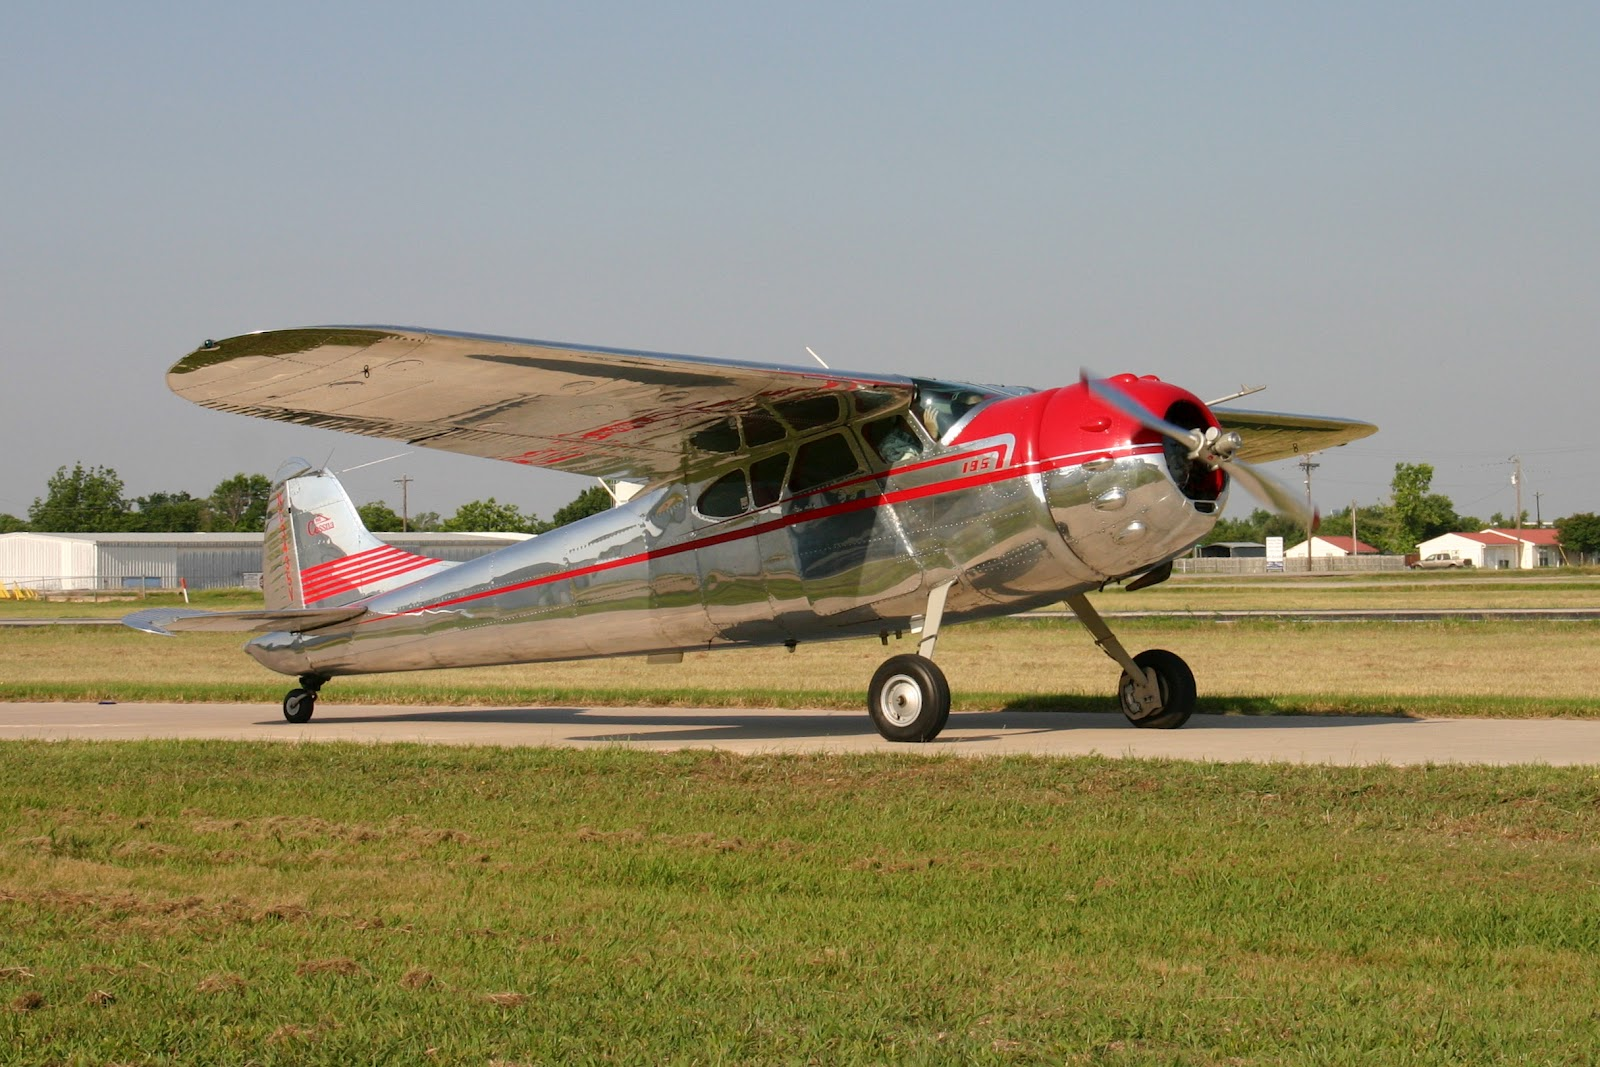 Dan Linn's Blog: Hangar Time